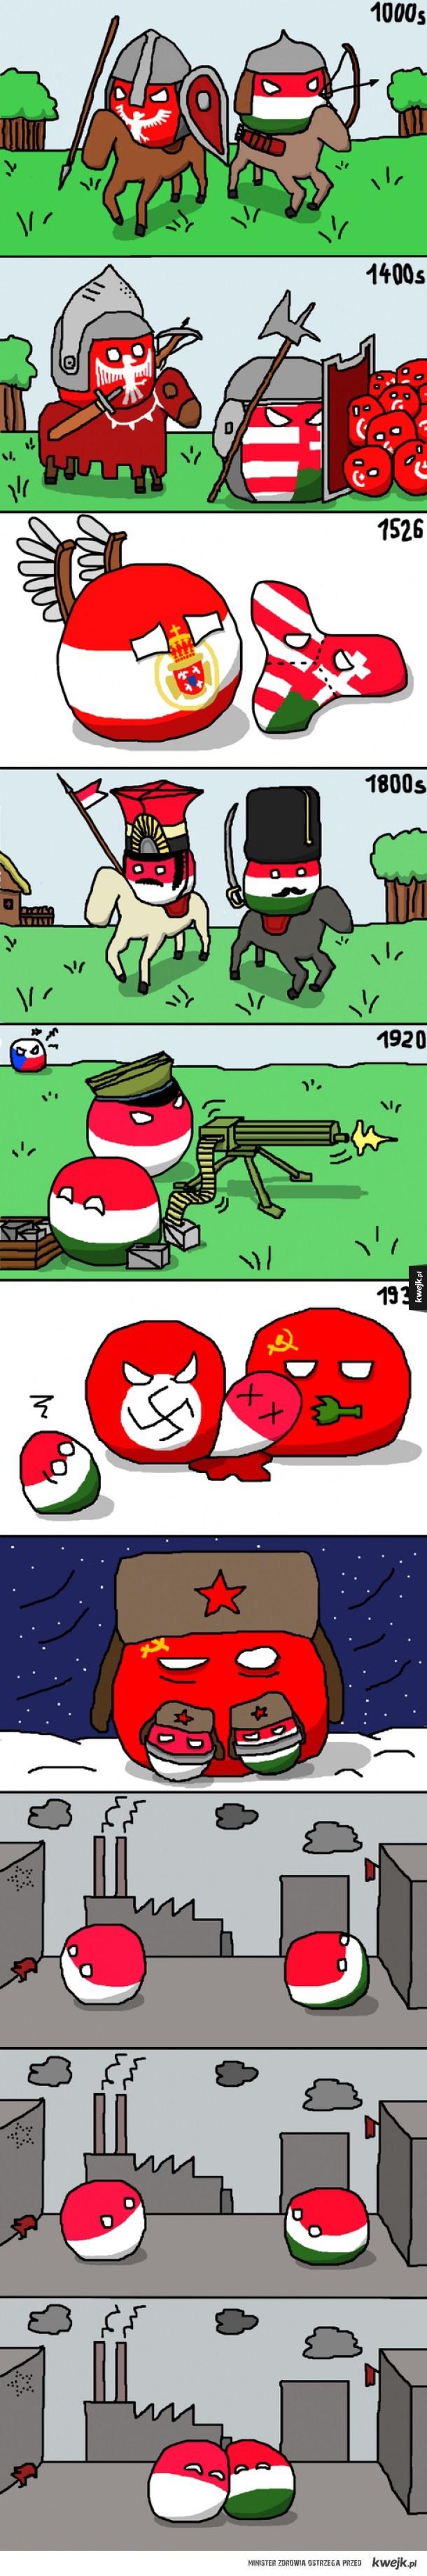 Dwa bratanki - komiksy z Polandball i HungaryBall!